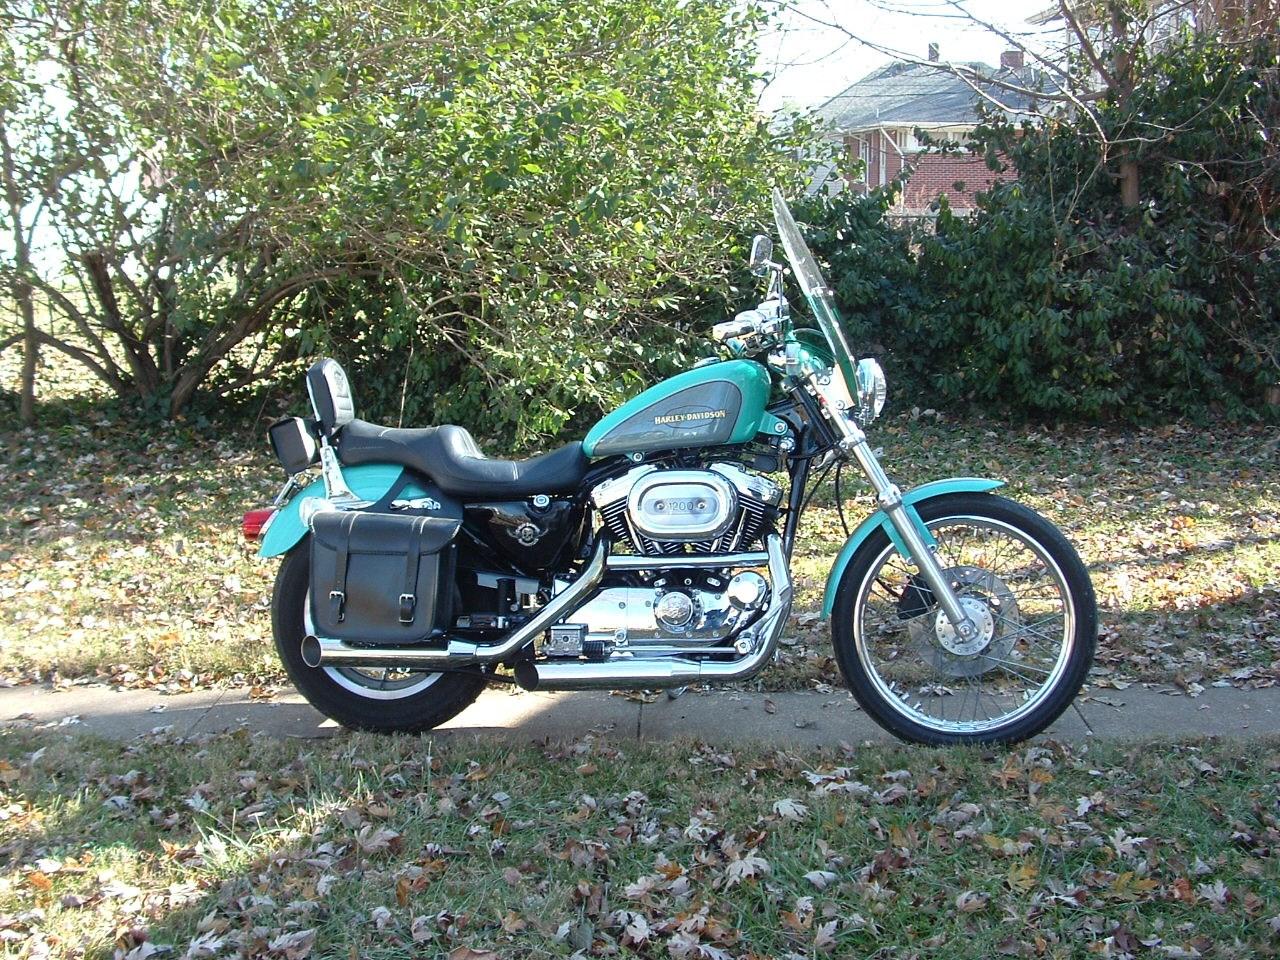 Motorcycles For Sale In Ma >> 2000 Harley-Davidson® XL1200C Sportster® 1200 Custom (Metallic Teal/Gunmetal Gray), Saint ...